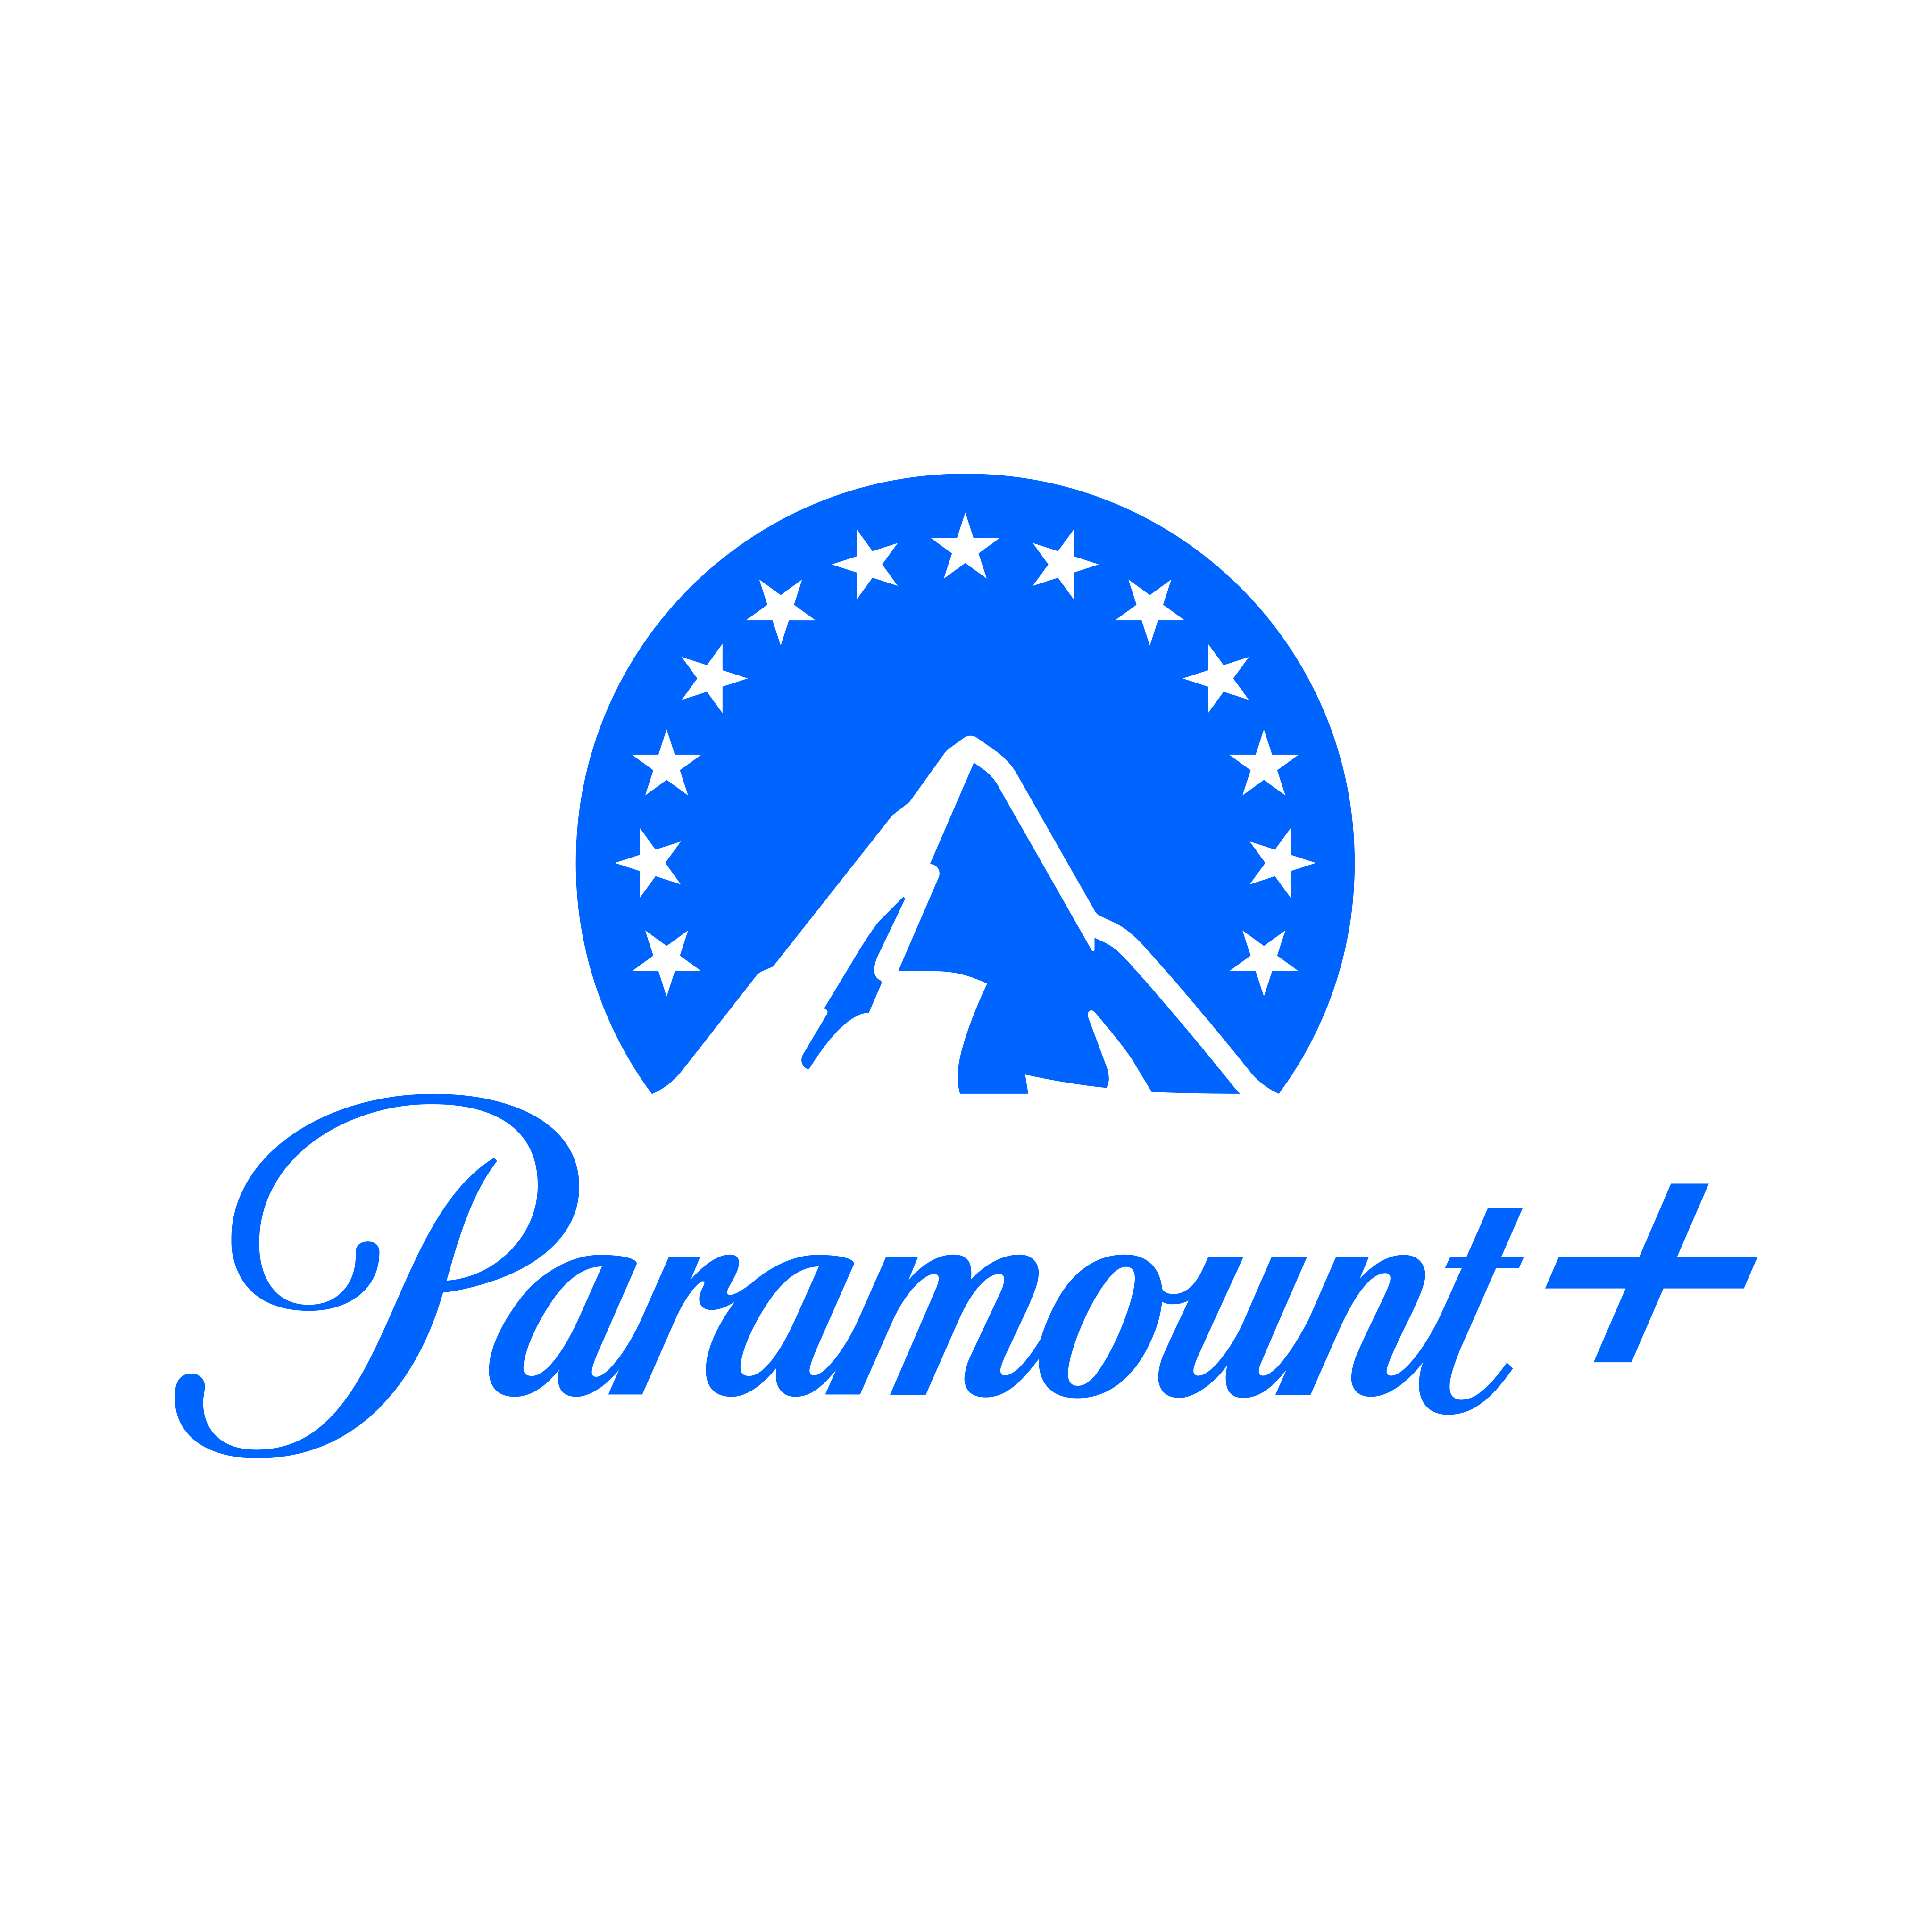 paramount plus logo 0 - Paramount+ Logo